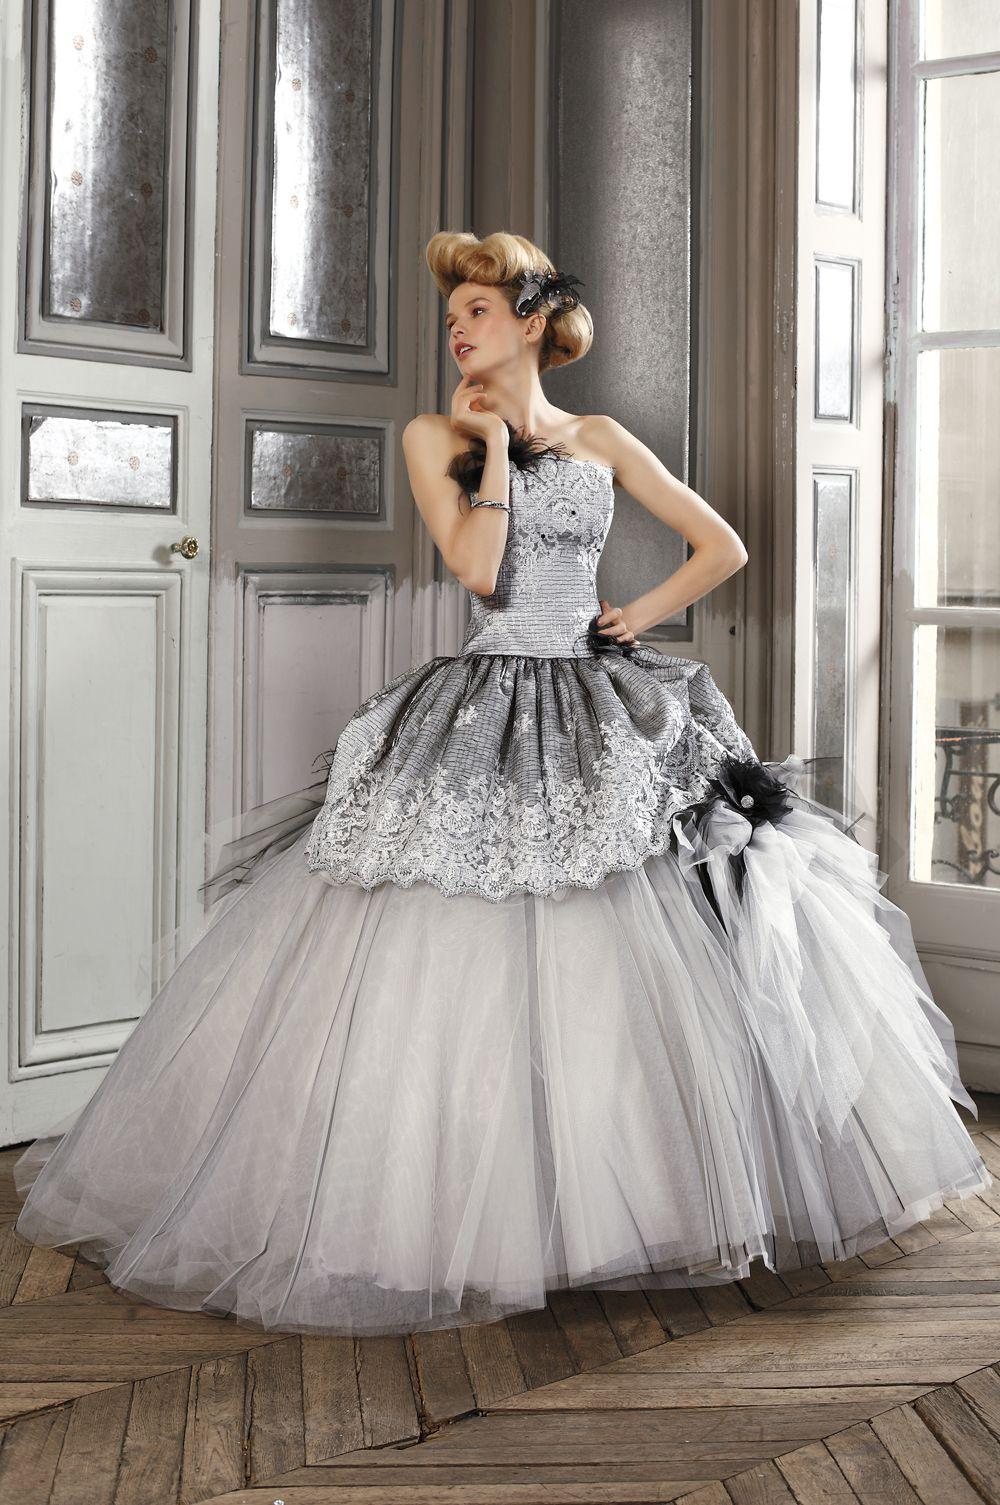 Eli Shay Wedding Dress Collections 2012 Gift Ecru Black Dress